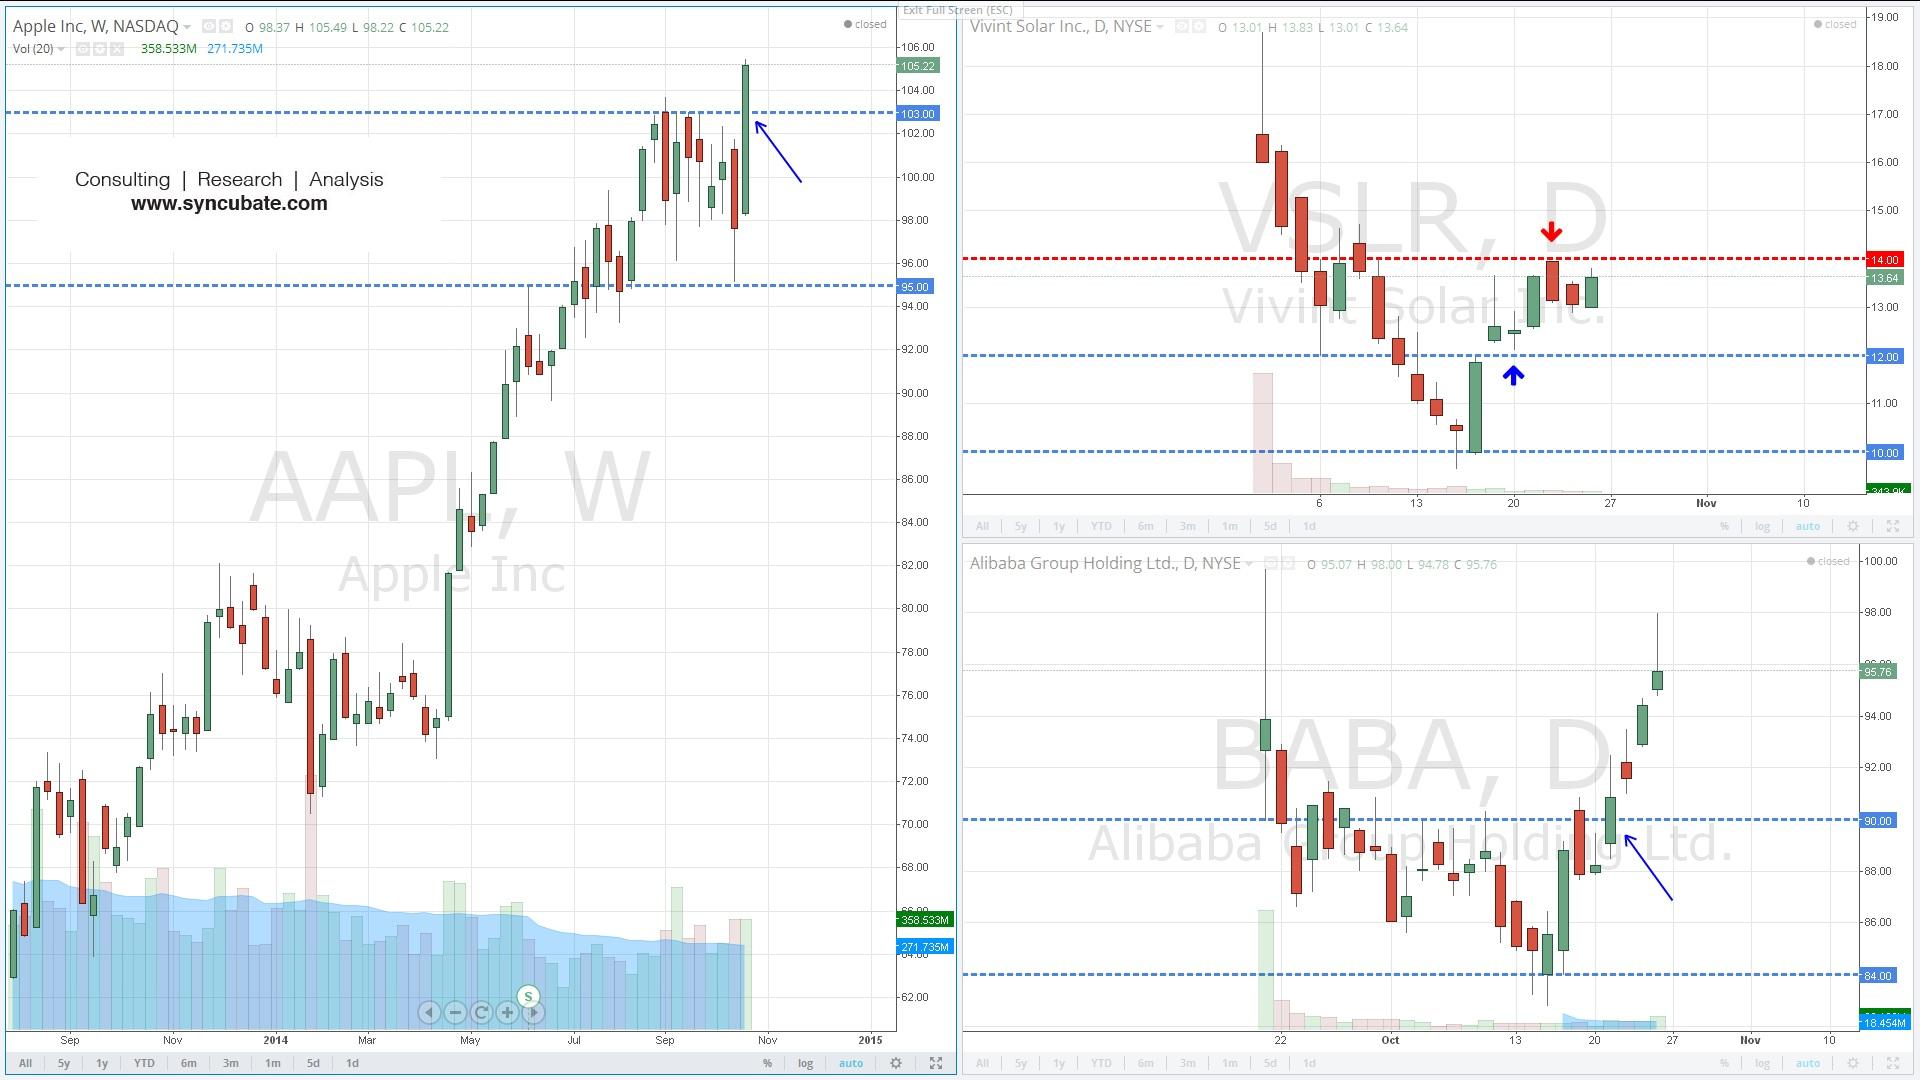 $AAPL : Apple Inc. ; $VSLR :Vivint Solar Inc. ; $BABA :Alibaba Group Holding Ltd.